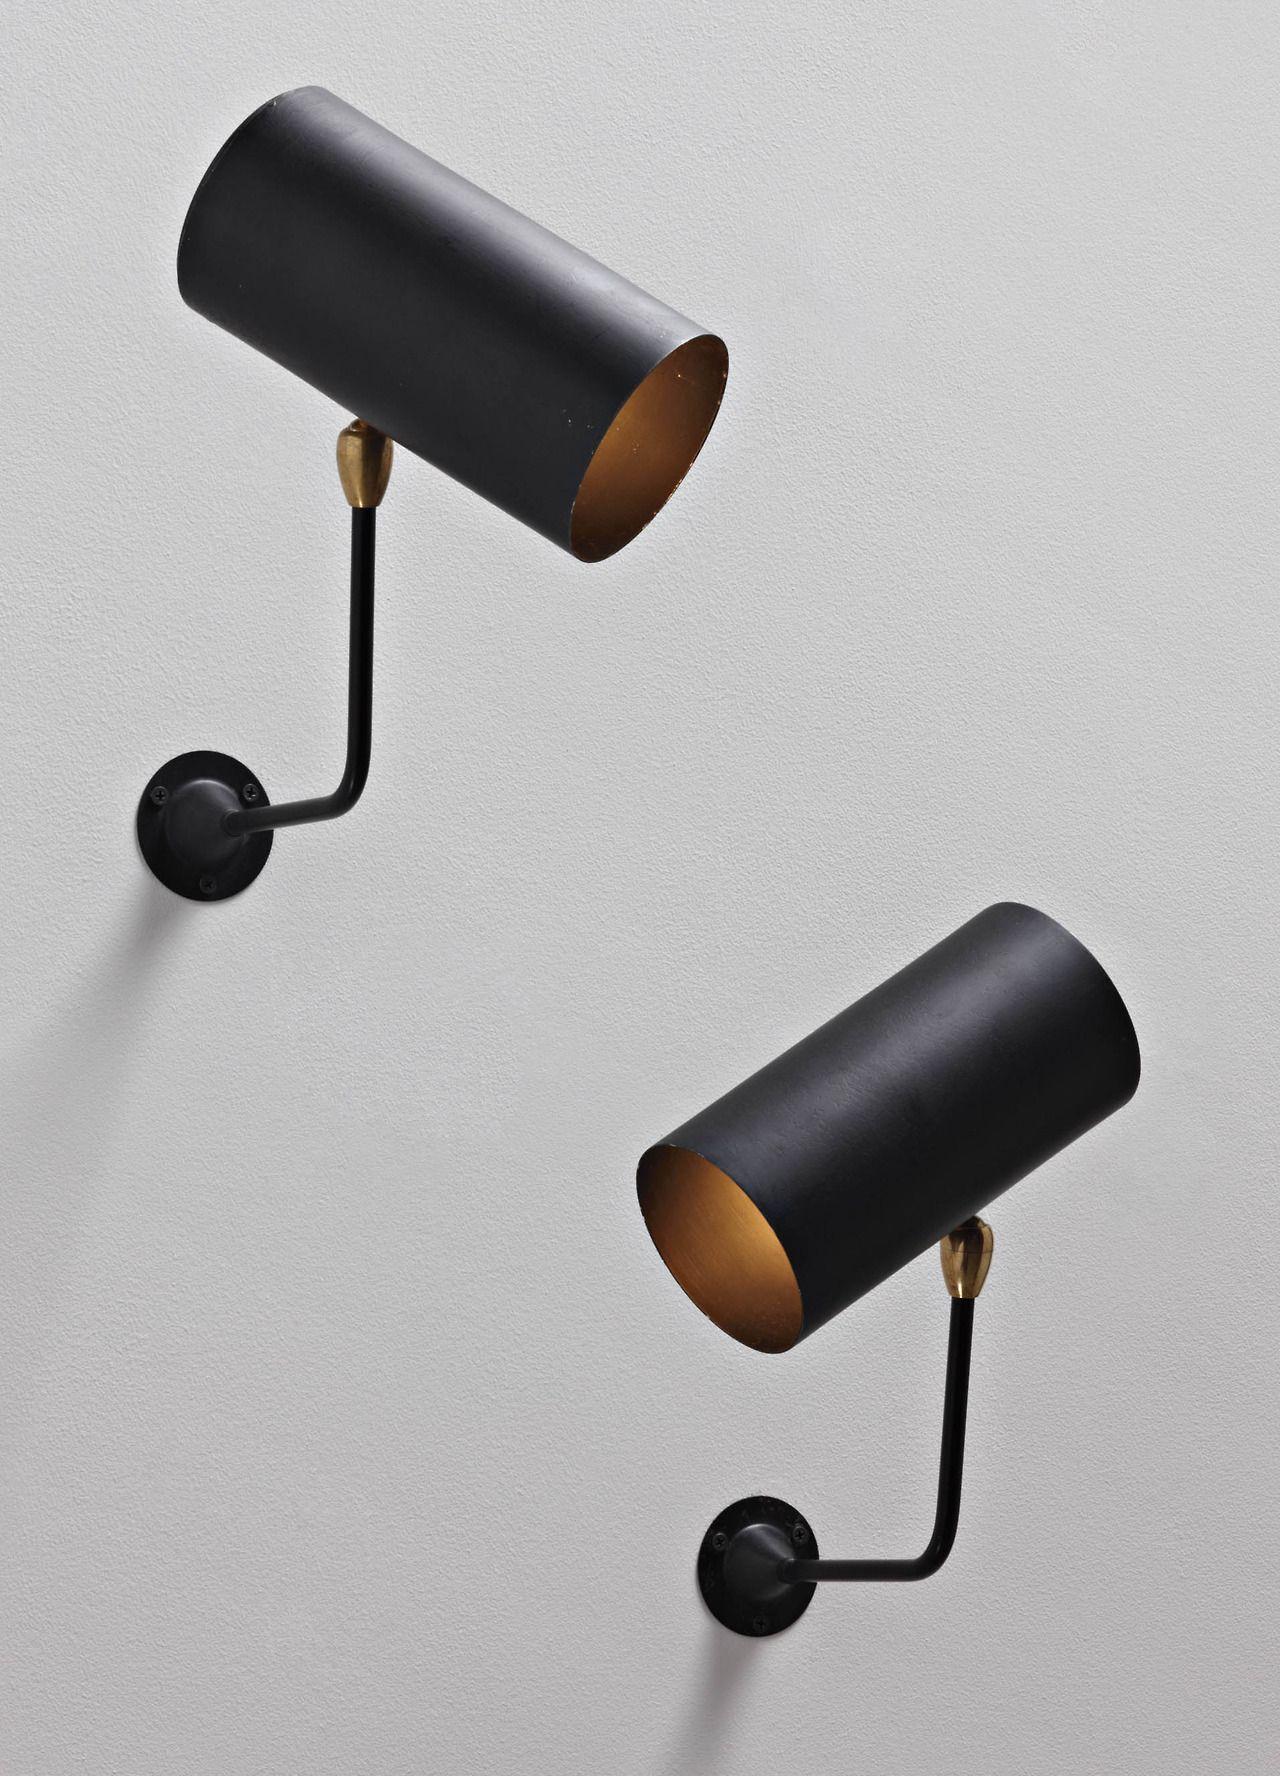 Serge Mouille, Tuyaux Wall Lightss for Atelier Serge Mouille